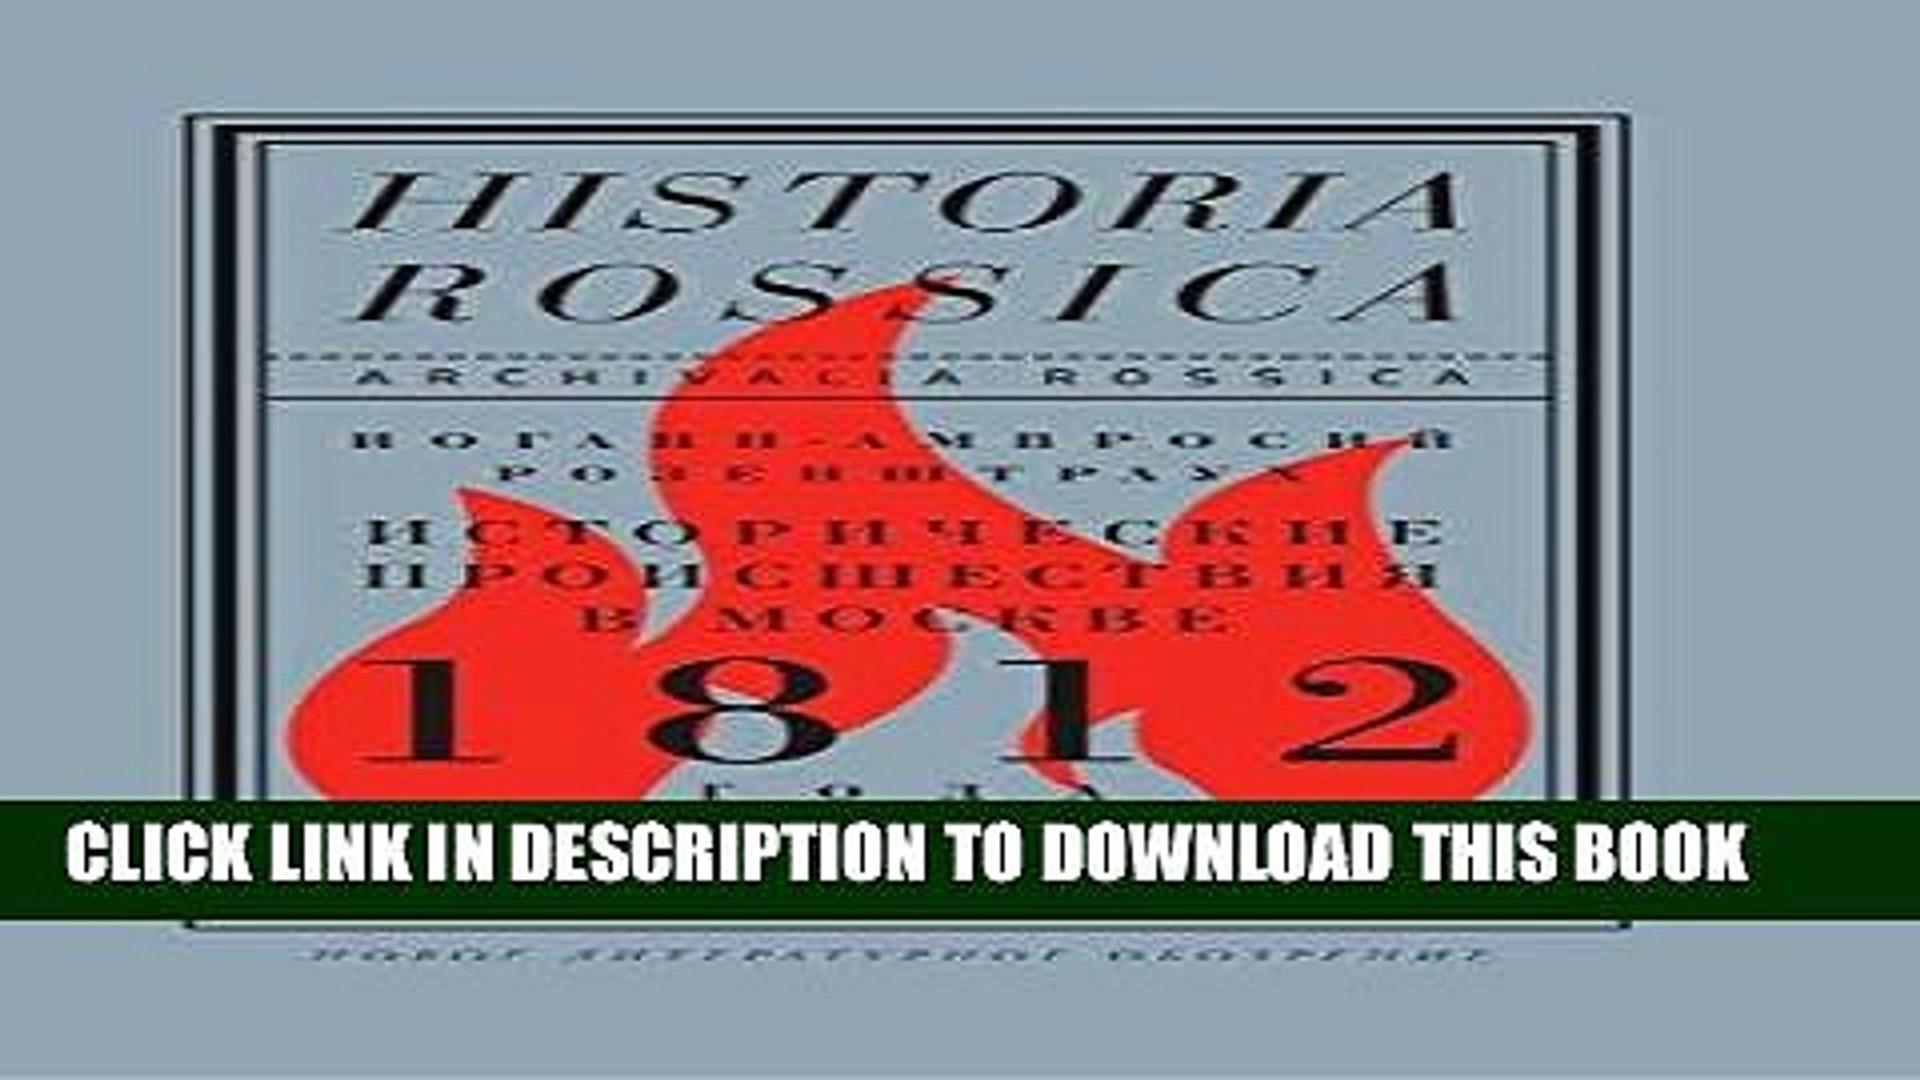 Read Now И�ториче�кие прои�ше�тви� в Мо�кве 1812 года во